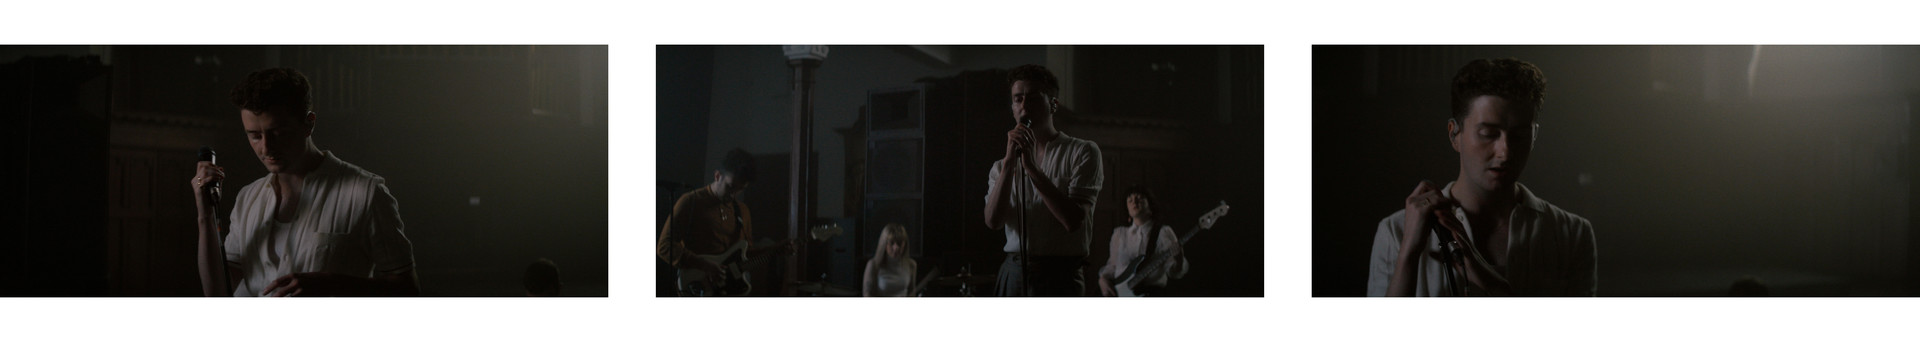 Joesef - DIMYFG Full Band